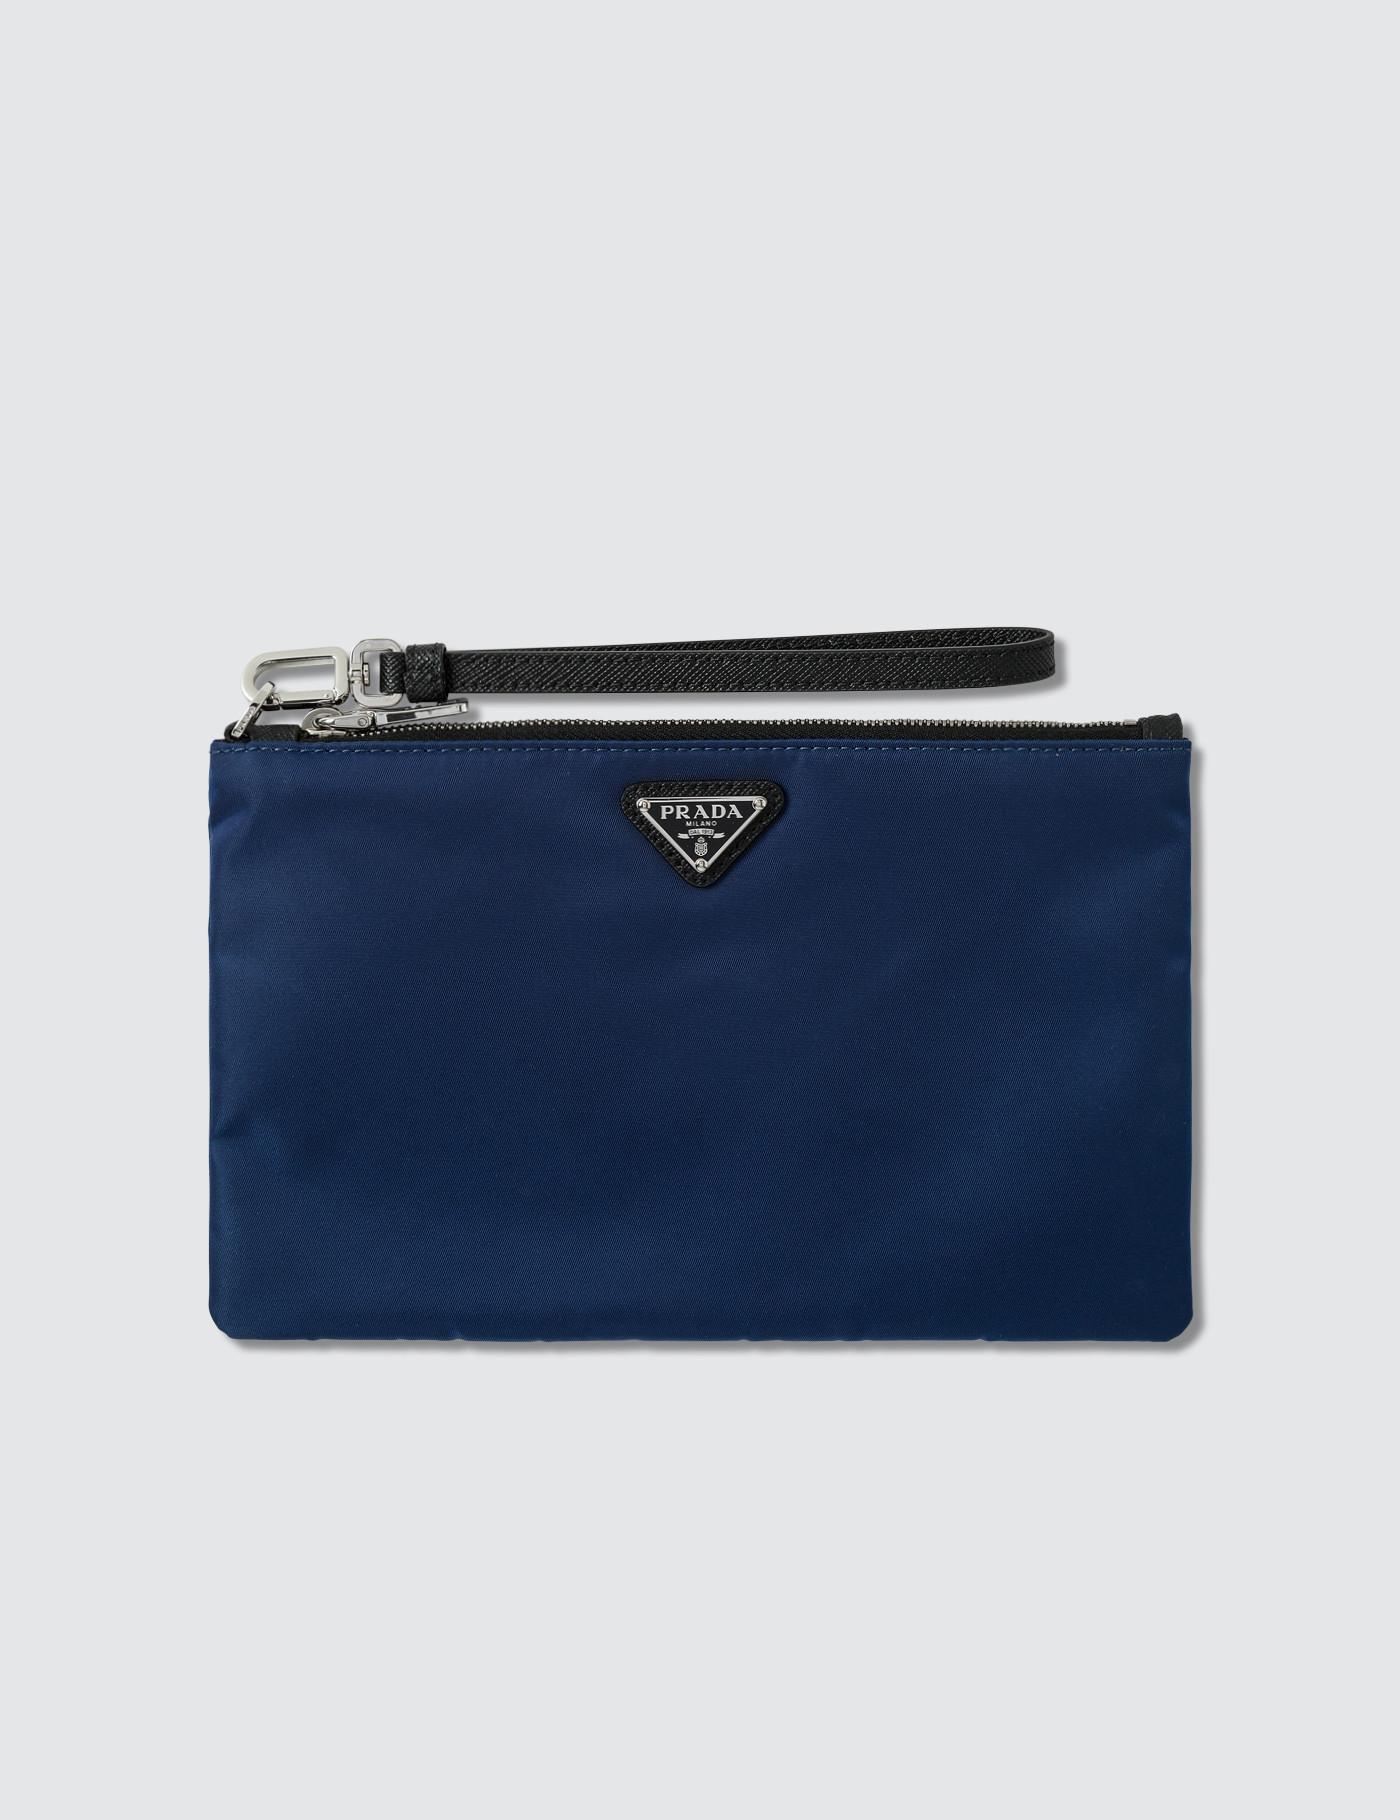 Prada - Blue Logo Small Pouch for Men - Lyst. View fullscreen 1e66c5b59a870